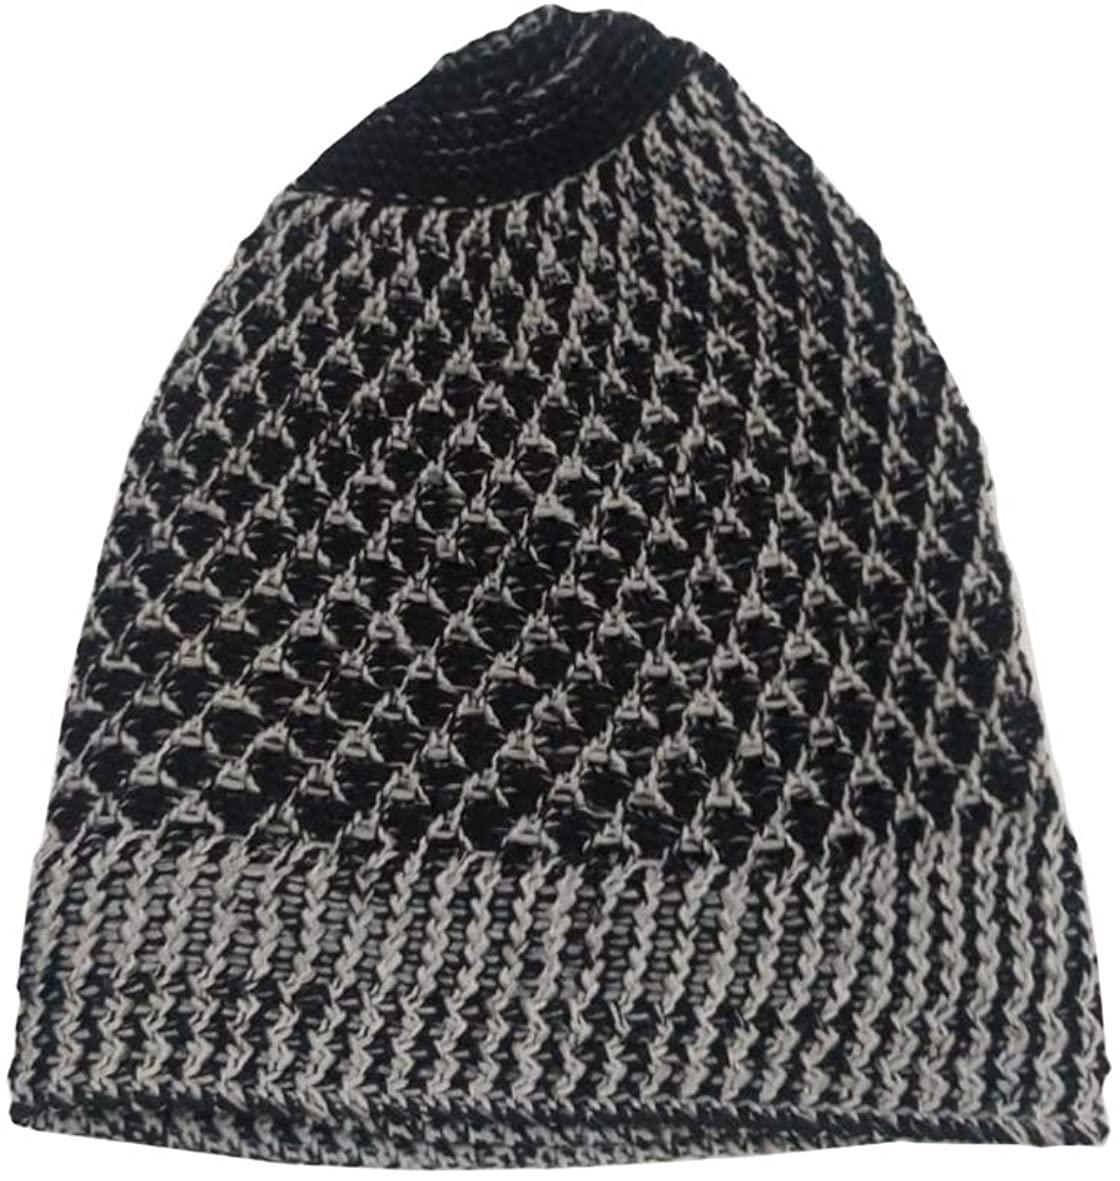 TheKufi Faded Grey Black Open-Weave Woven Nylon Stretchy Kufi Hat Skull Cap Beanie